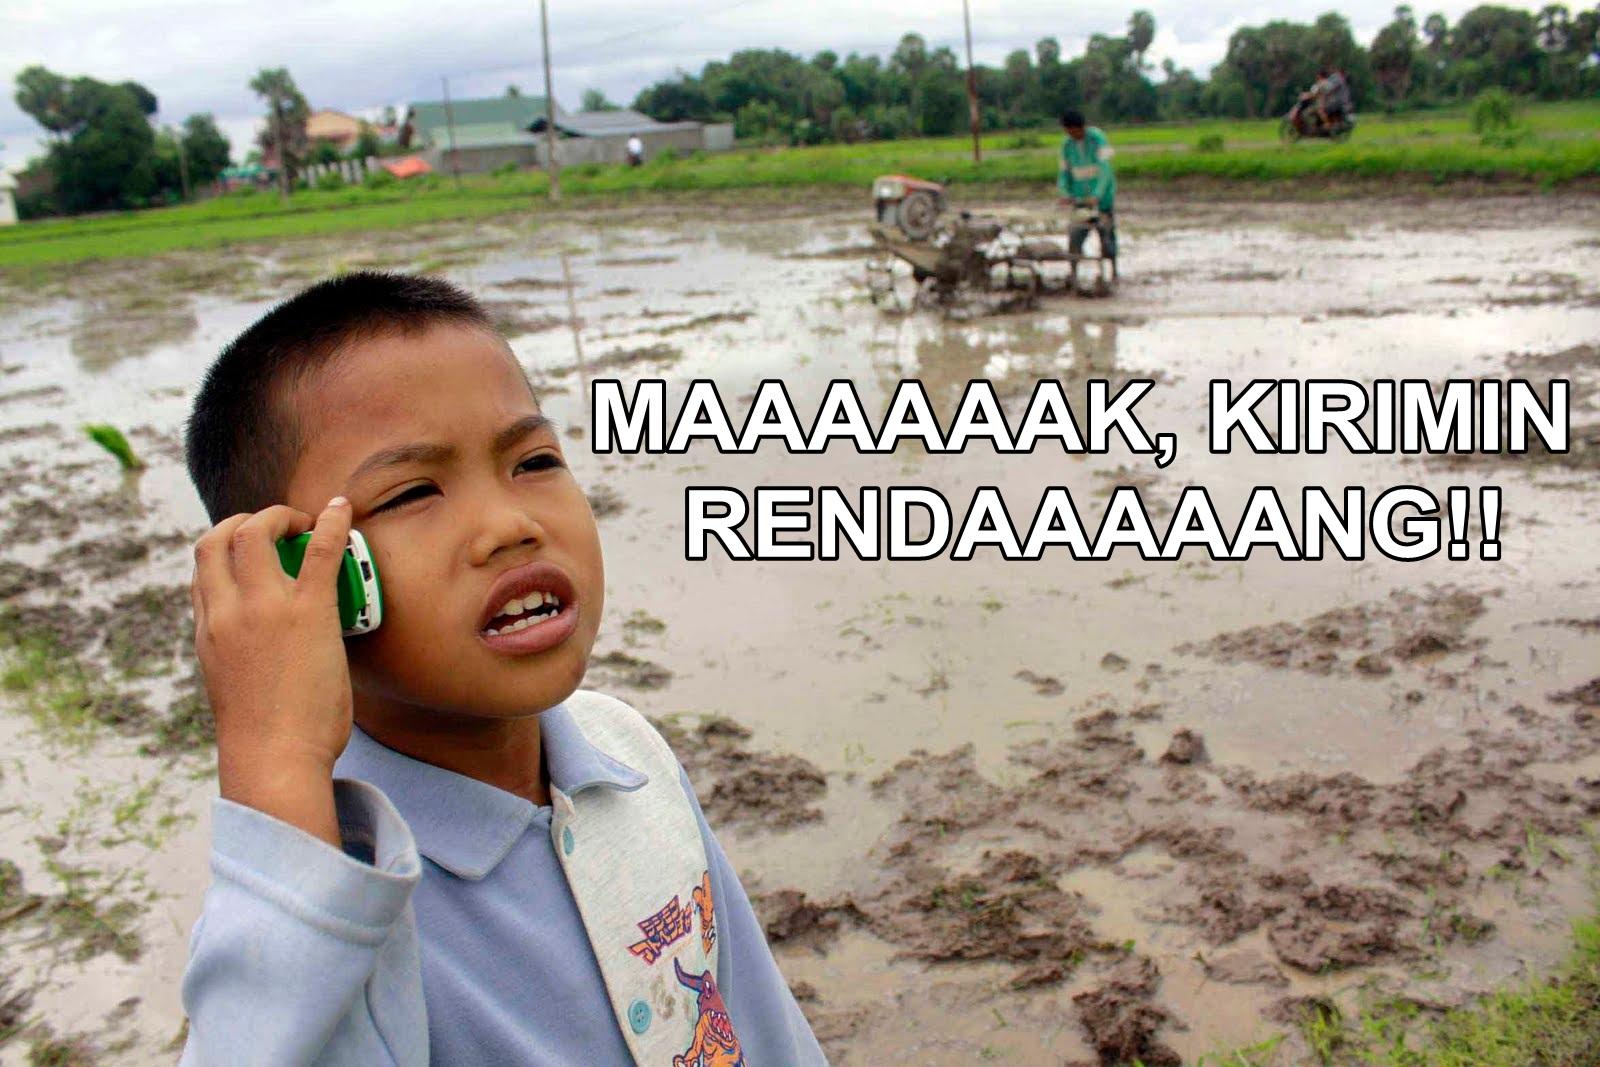 30 Meme Realita Anak Kost An Kamu Pasti Ngalamin Deeh Kumpulan